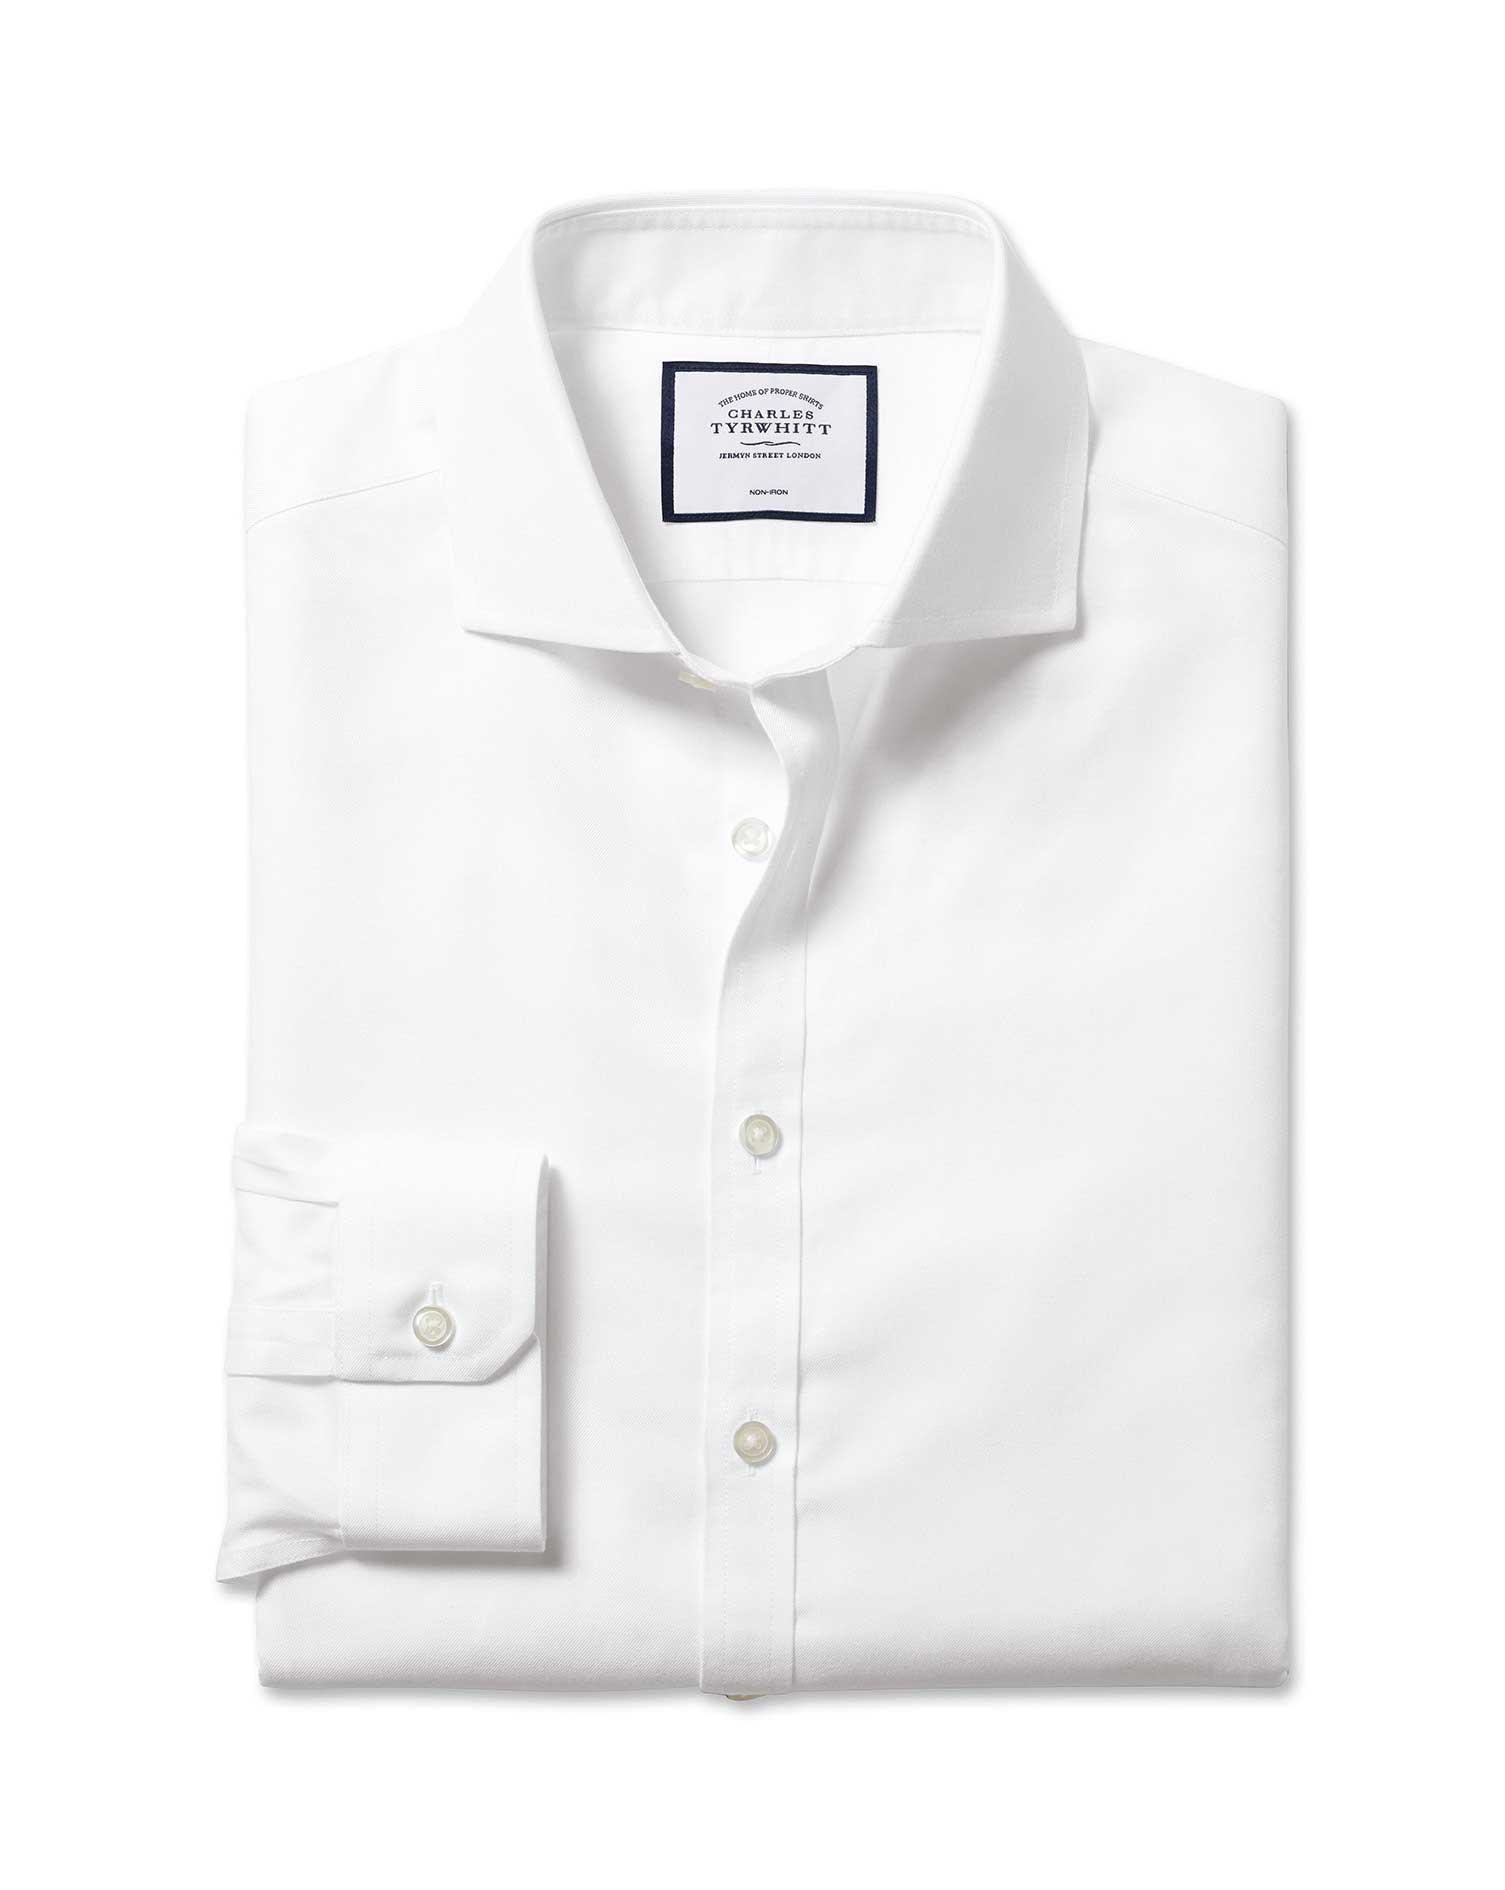 Cotton Super Slim Fit White Non-Iron Twill Cutaway Shirt